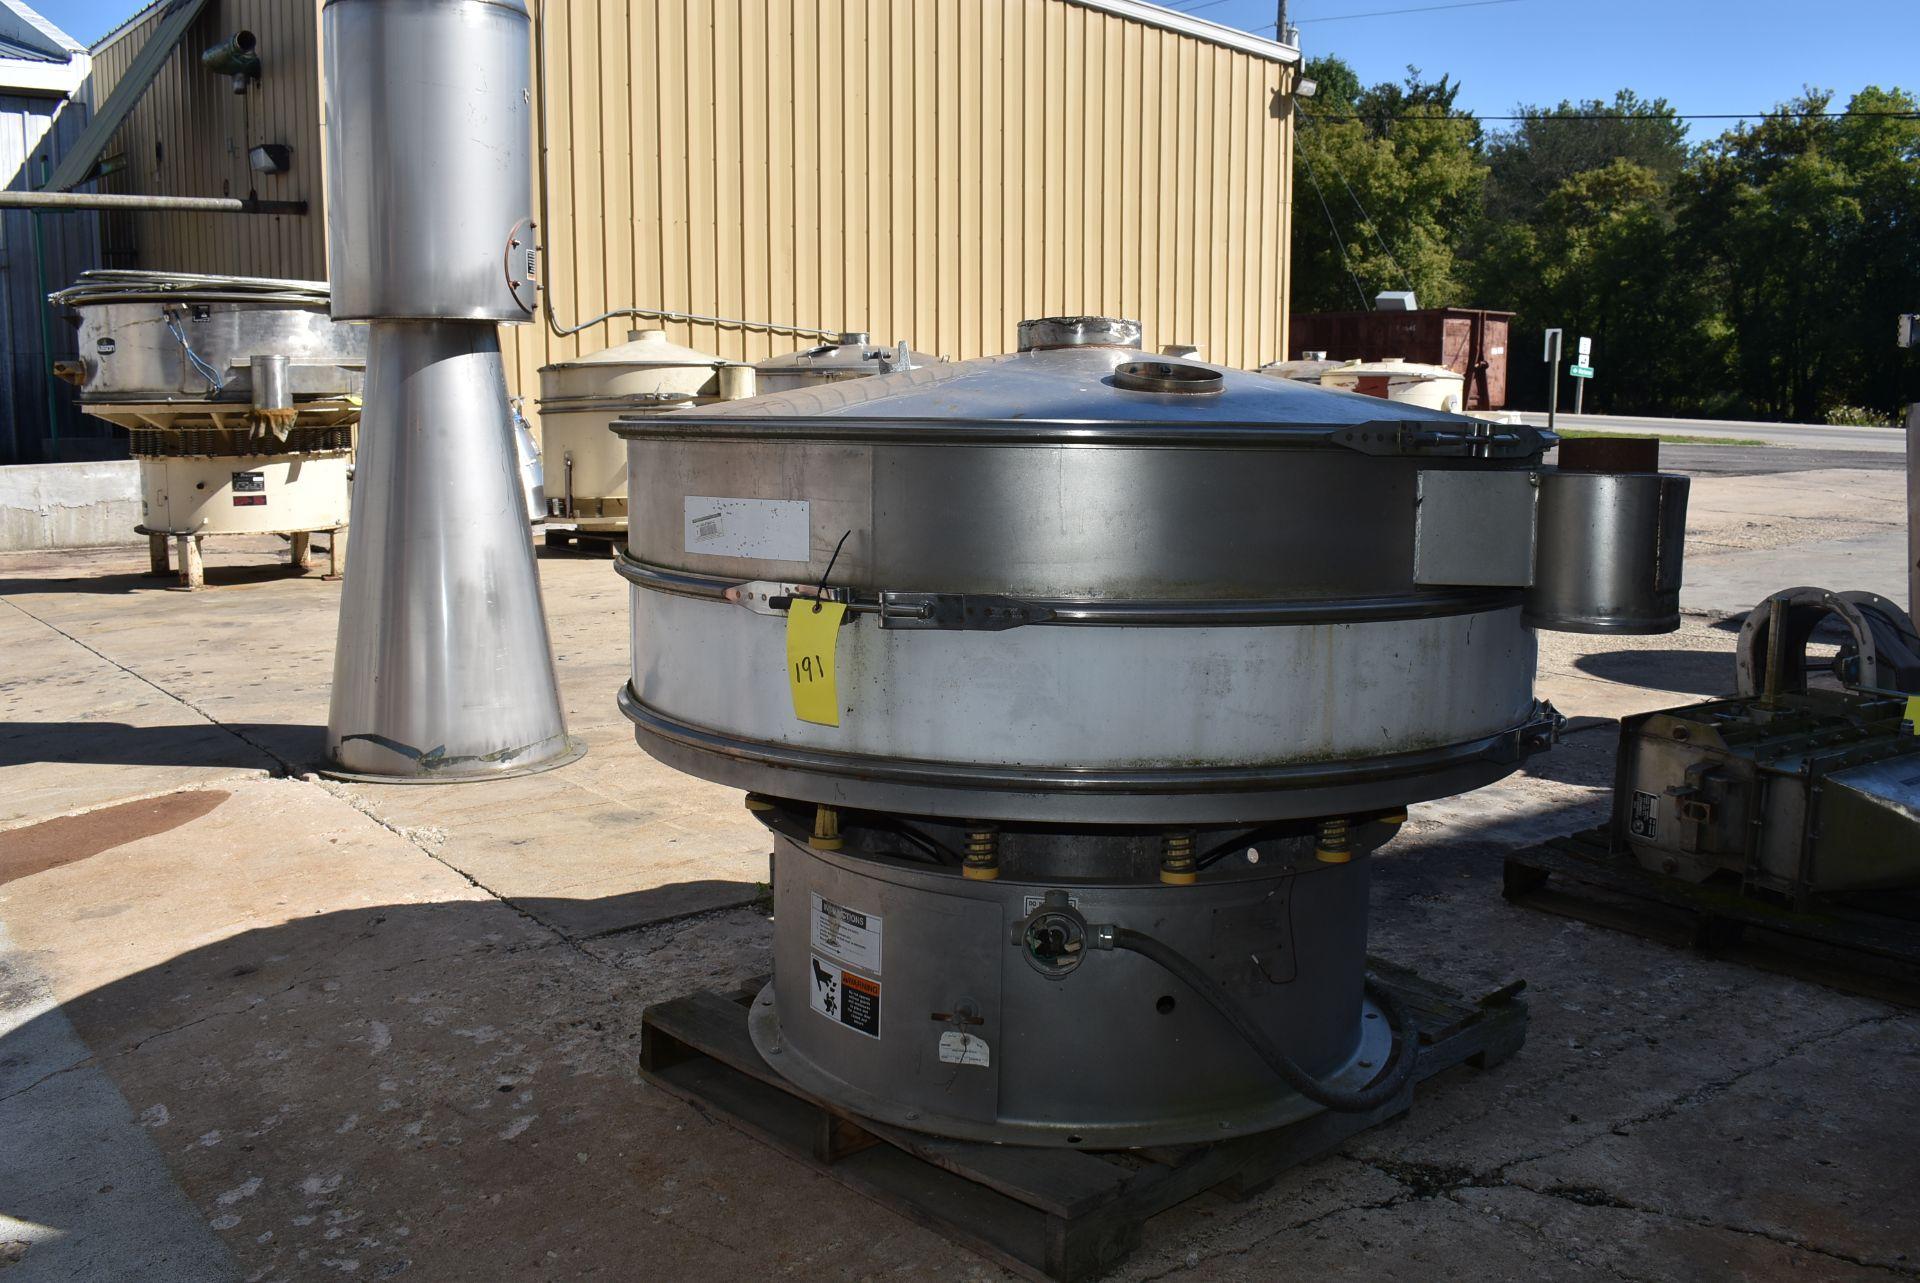 SWECO Model #X60-988 Vibratory Separator, SN 67890-A1297